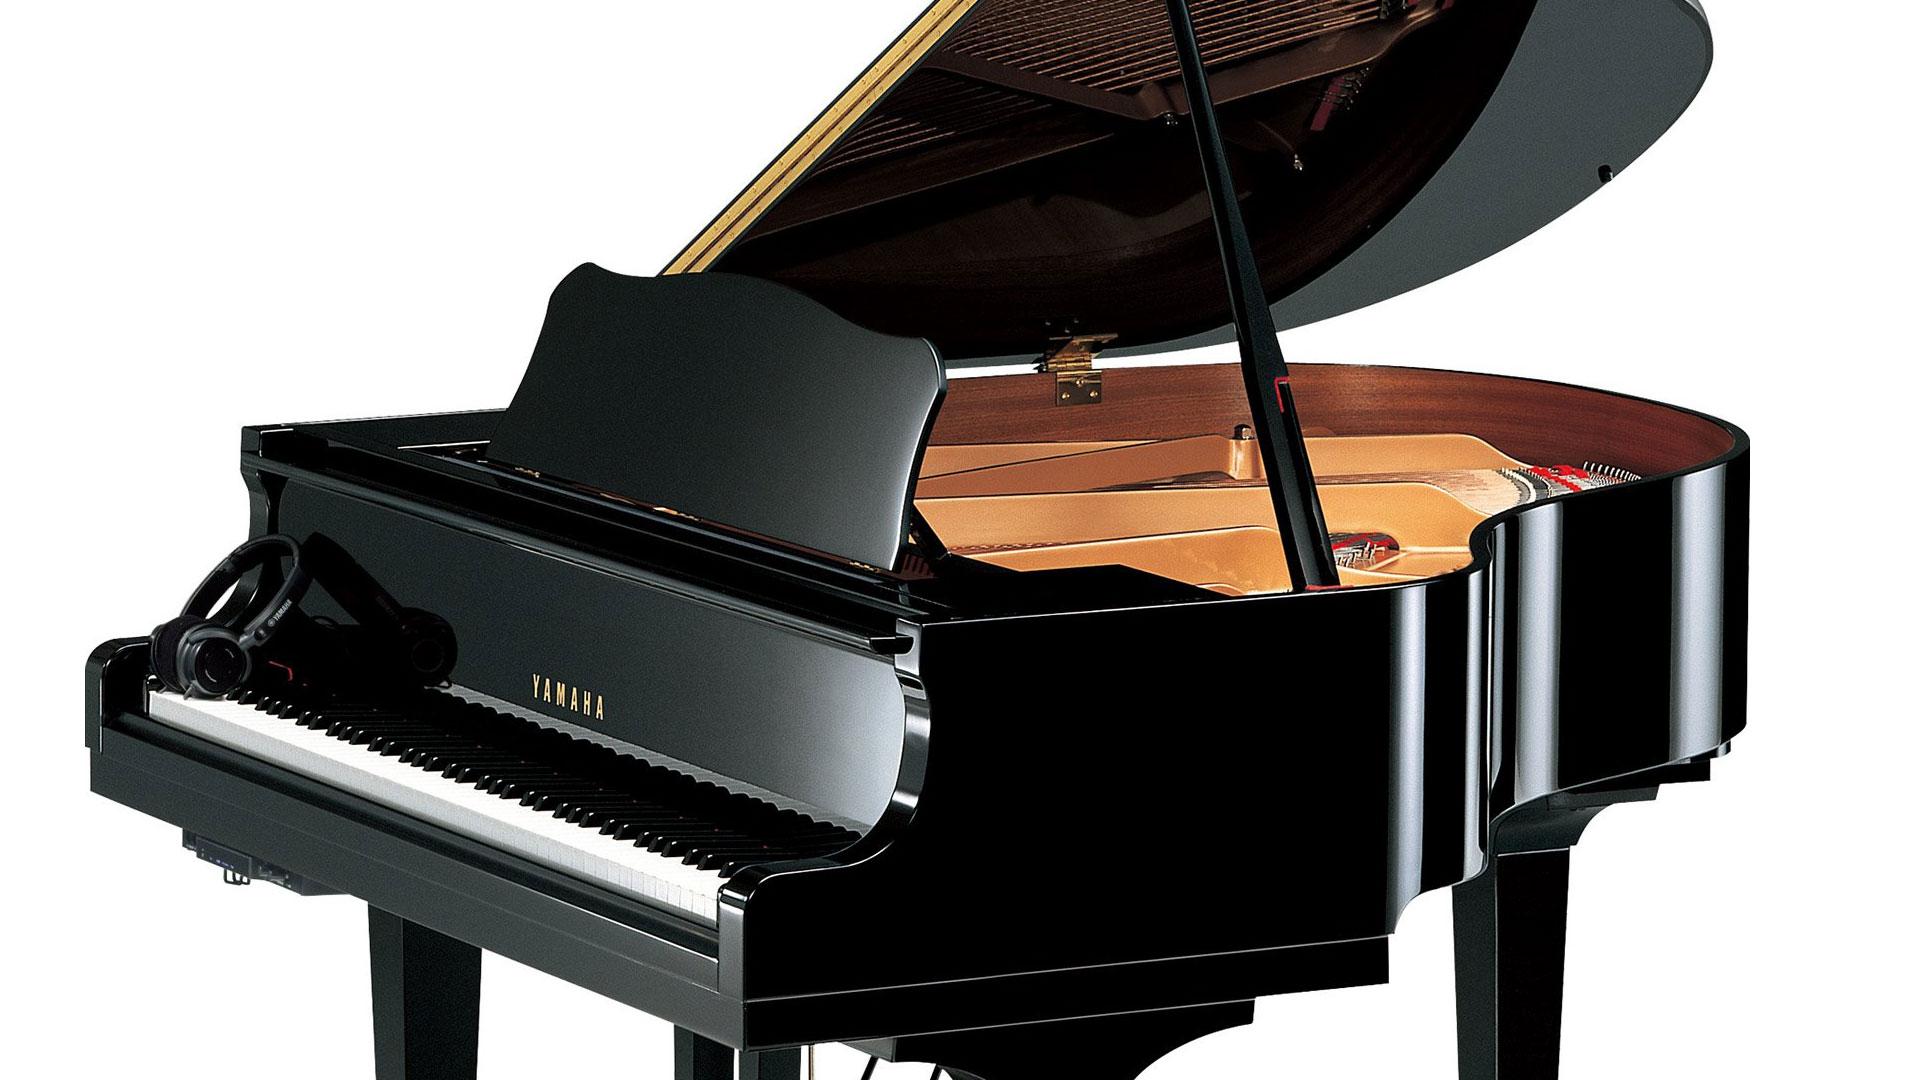 Yamaha GB1K SC2 SILENT Piano | Scottsdale, AZ Pianos